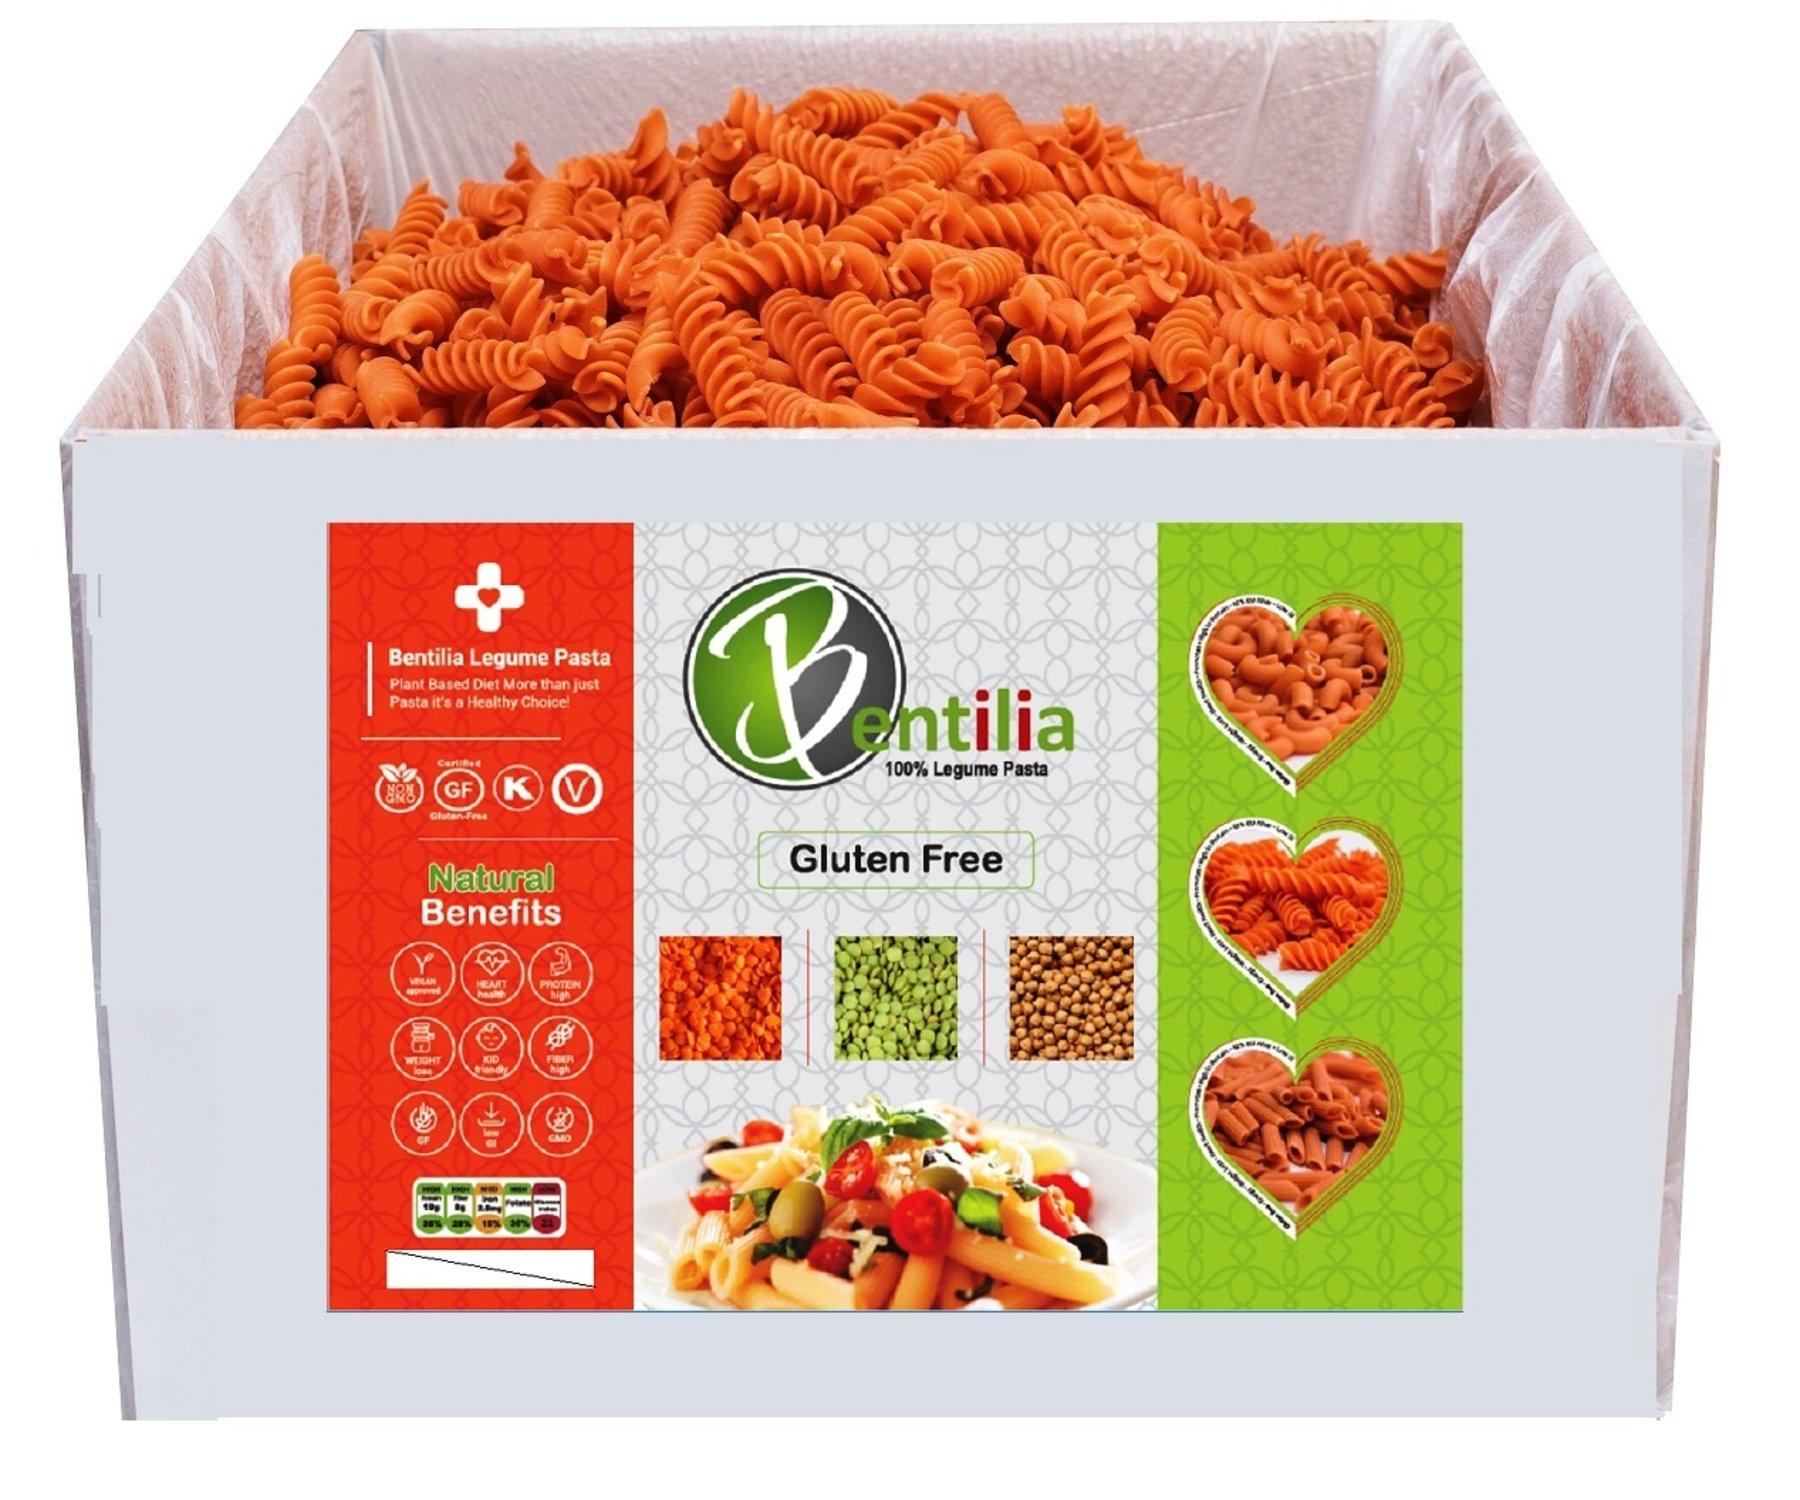 Bentilia Organic Gluten-Free Lentil Pasta, Red Lentil Rotini Organic, 10 lb, Bulk Case - 100% Natural, Low Glycemic Index, High Protein & Fiber, Non-GMO, Kosher Pasta